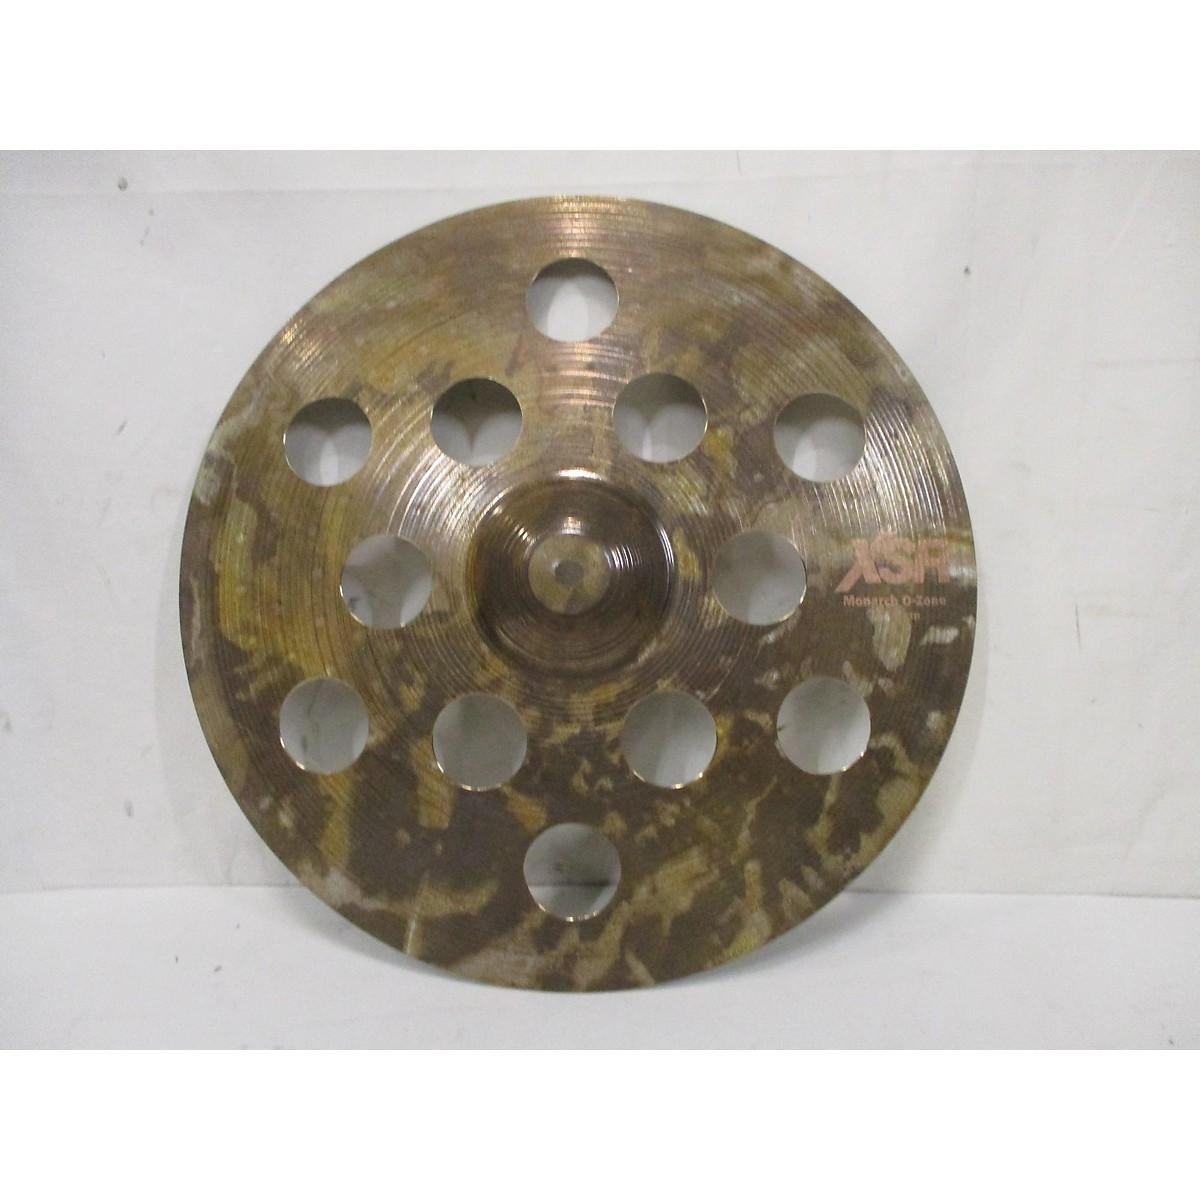 Sabian 16in XSR Monarch Ozone Crash Cymbal